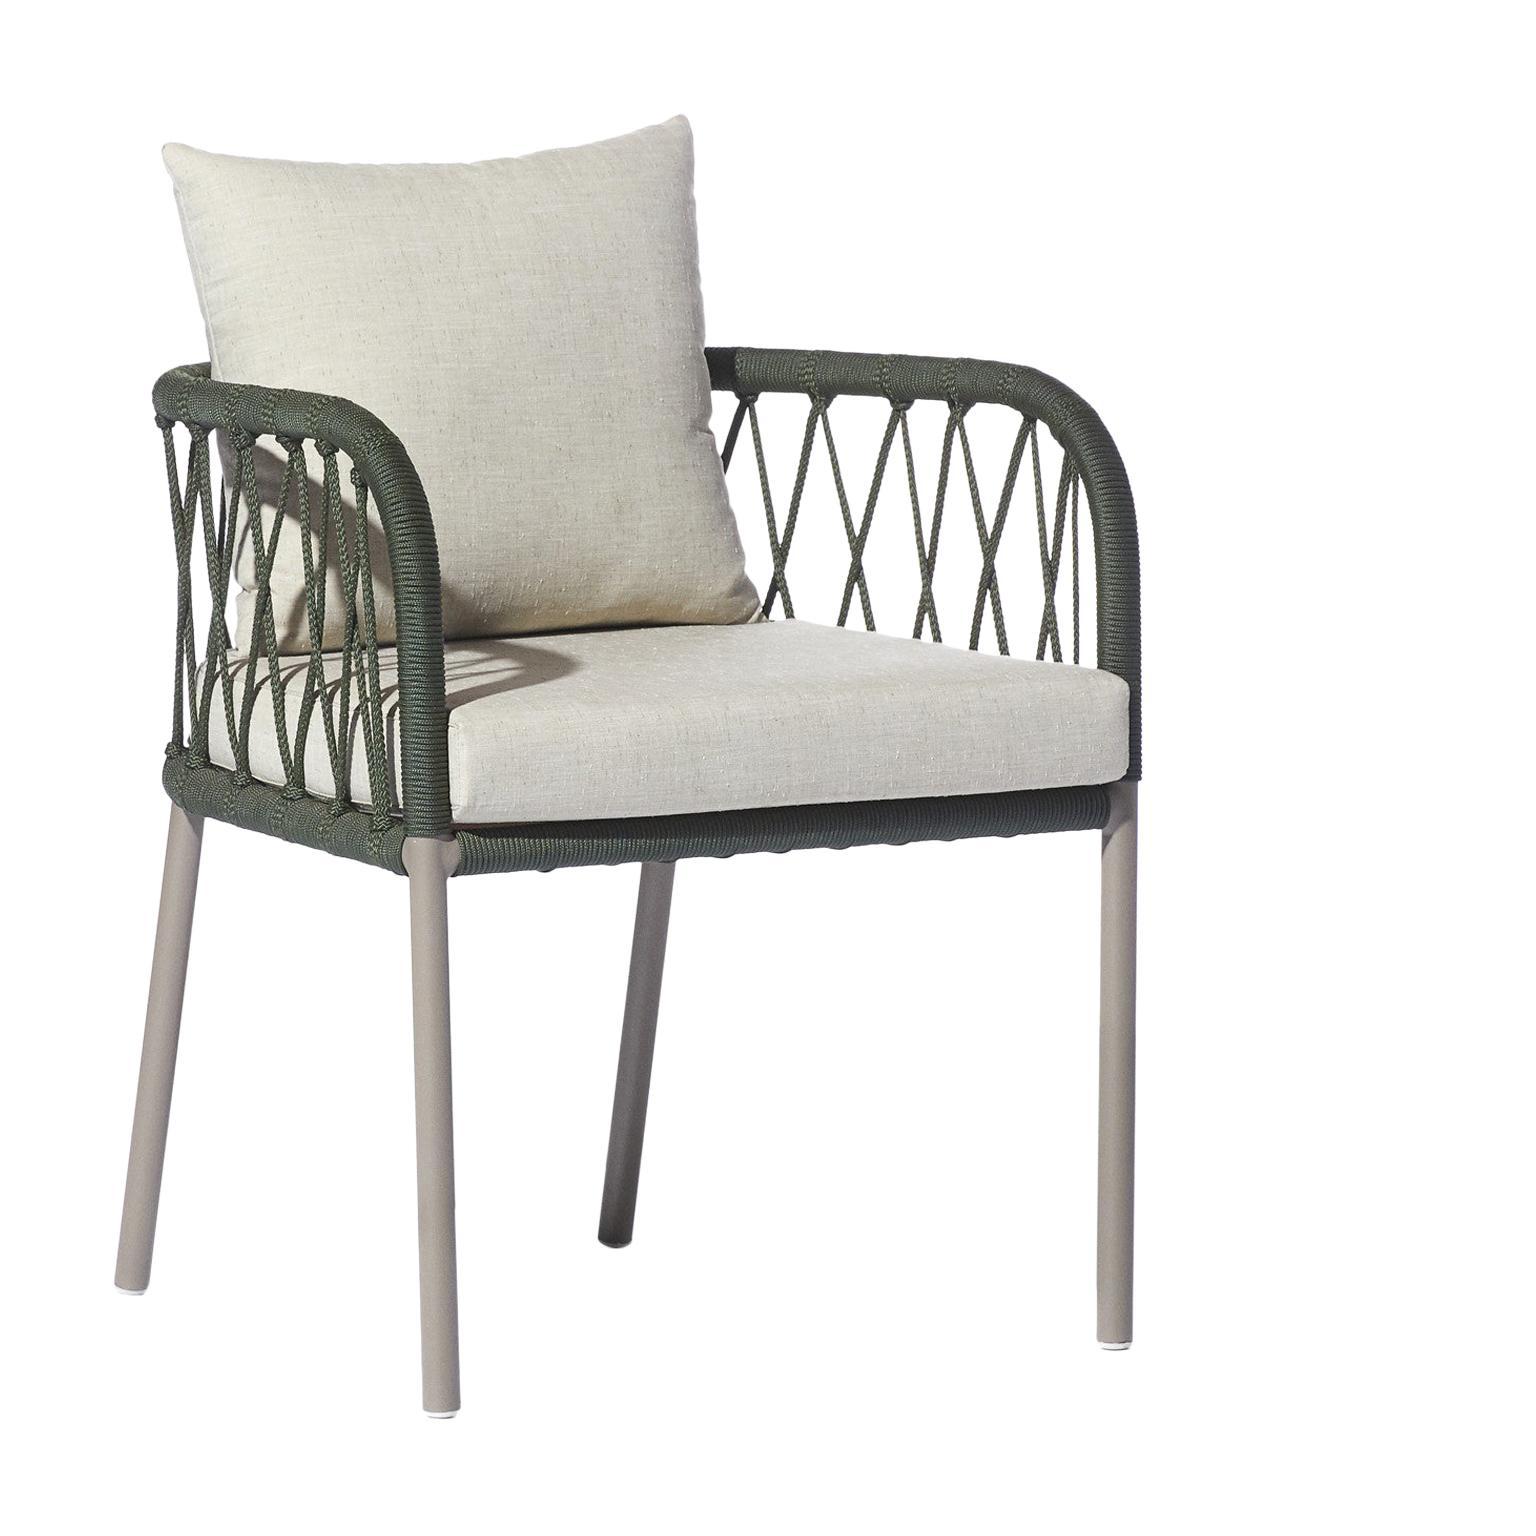 Bask Brazilian Contemporary Outdoor Metal Chair by Lattoog